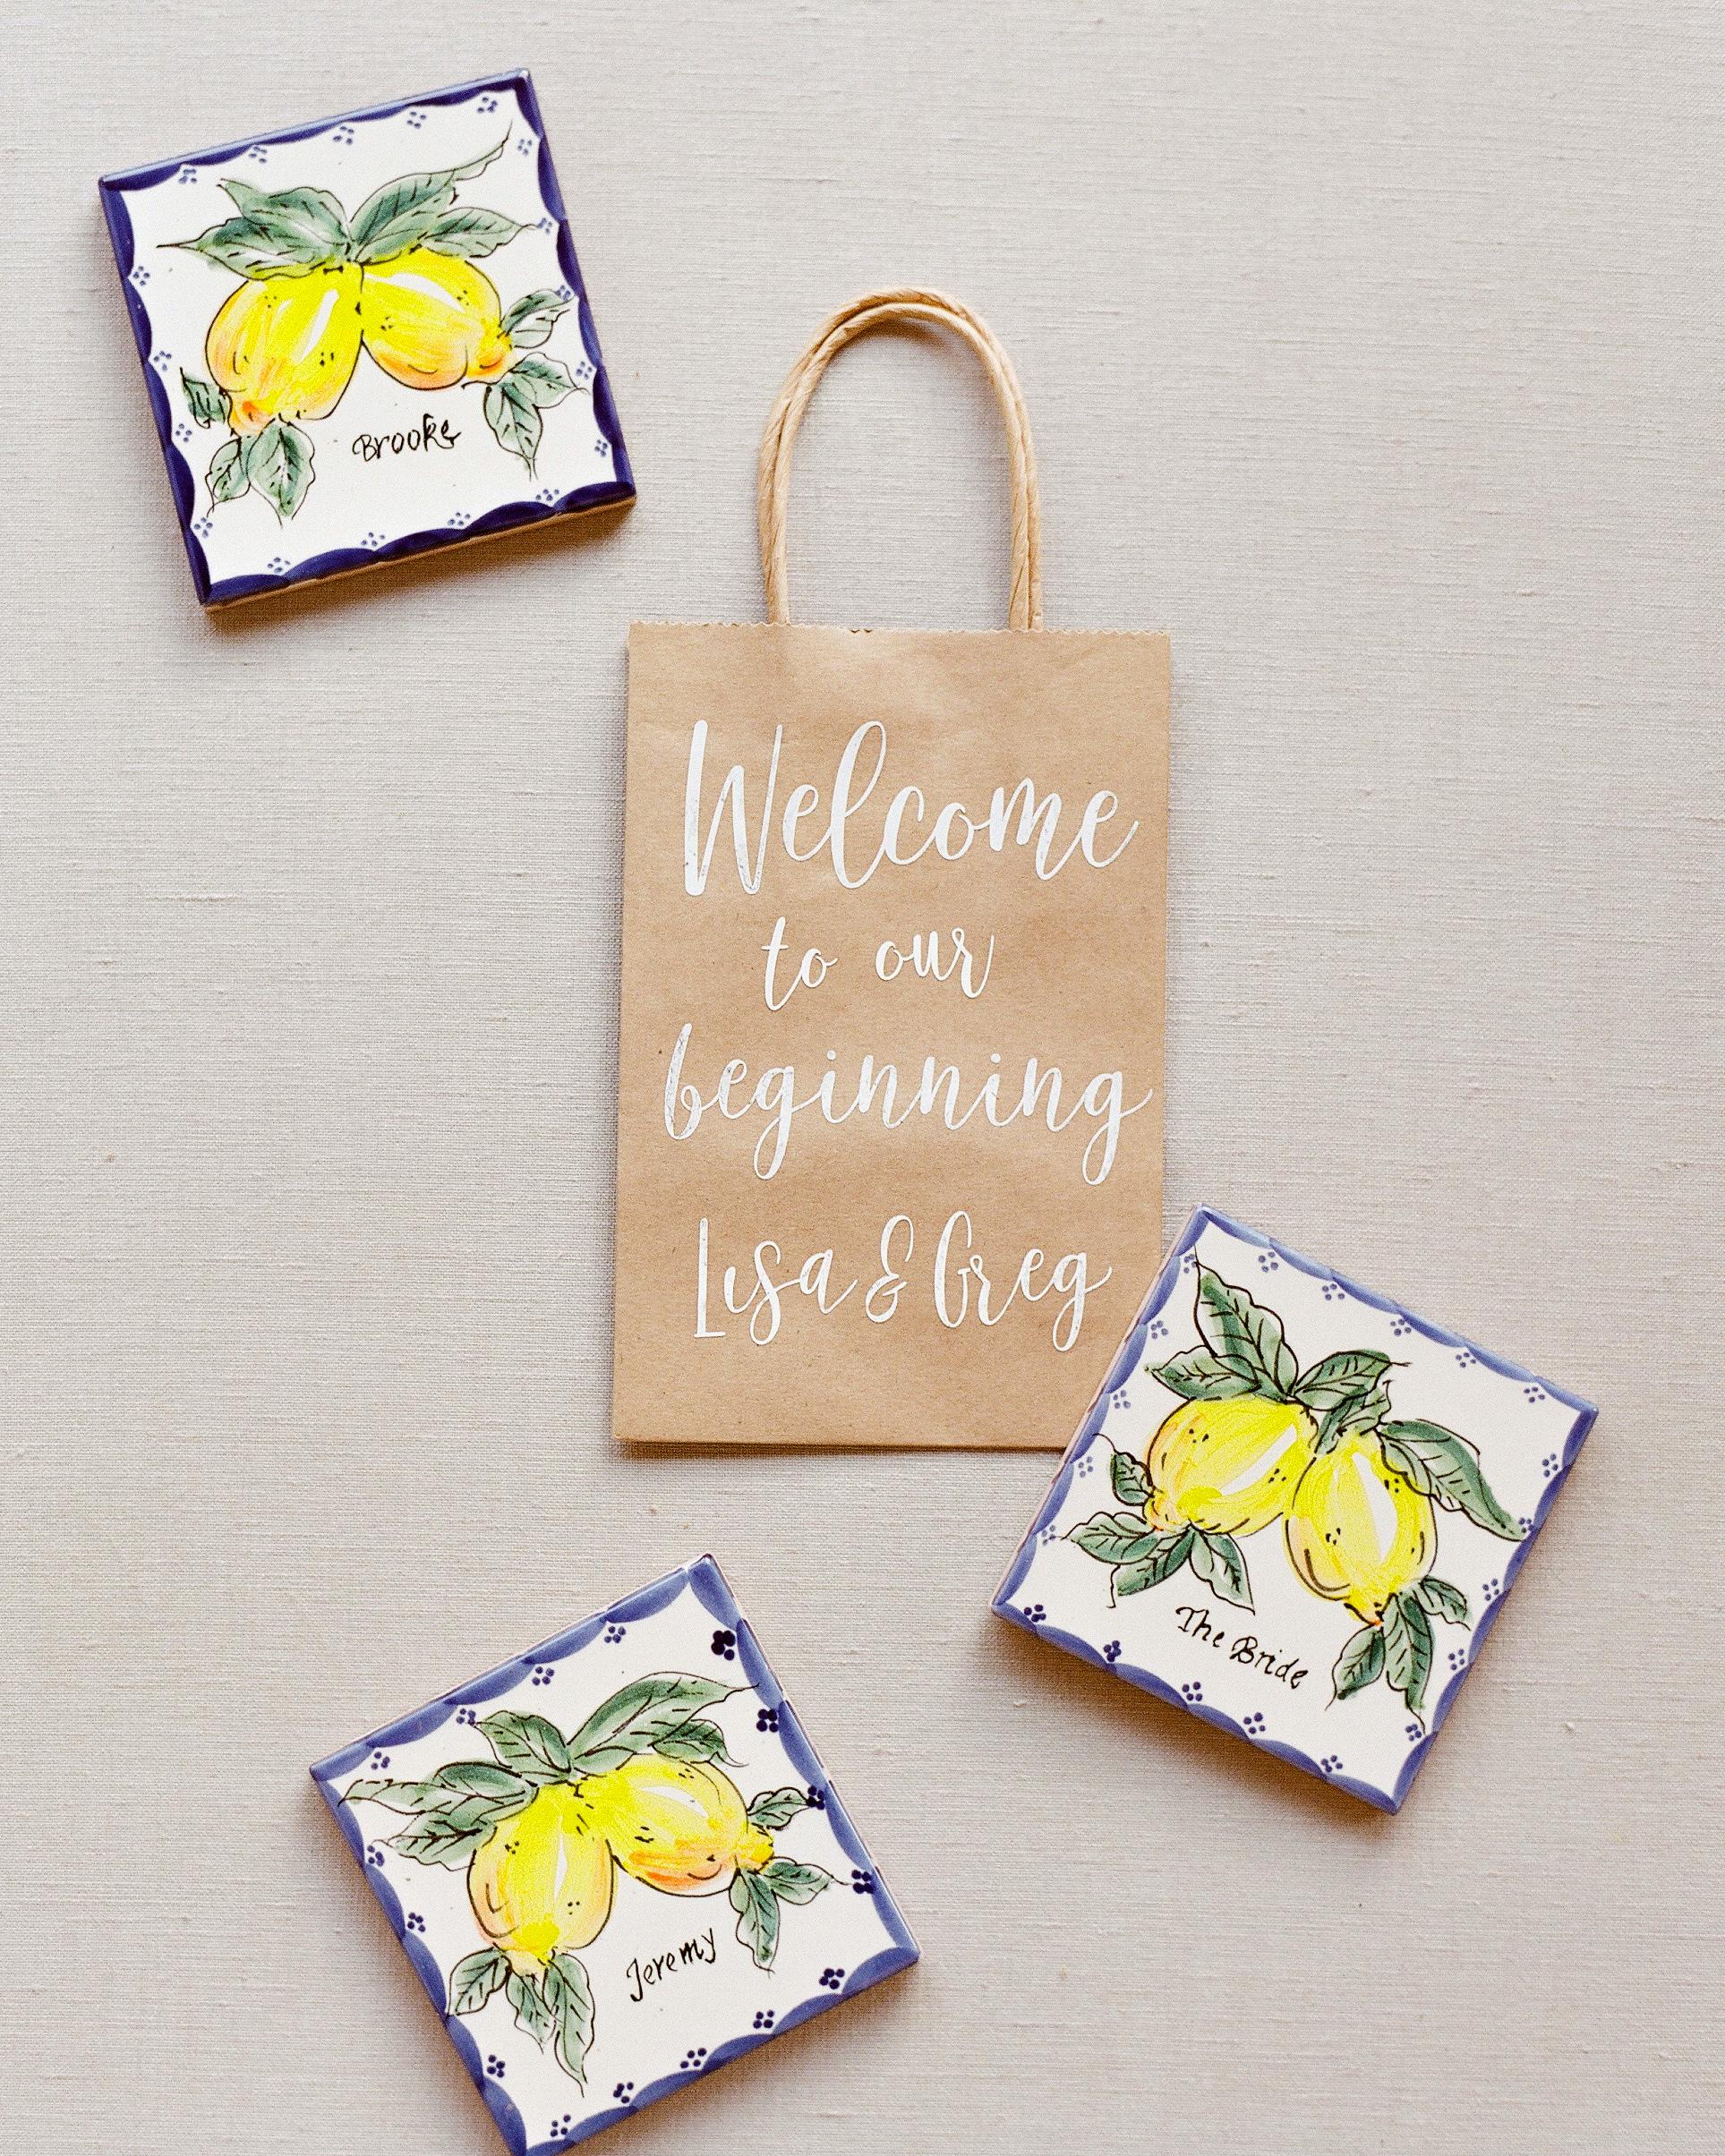 lisa greg italy wedding tiles favors